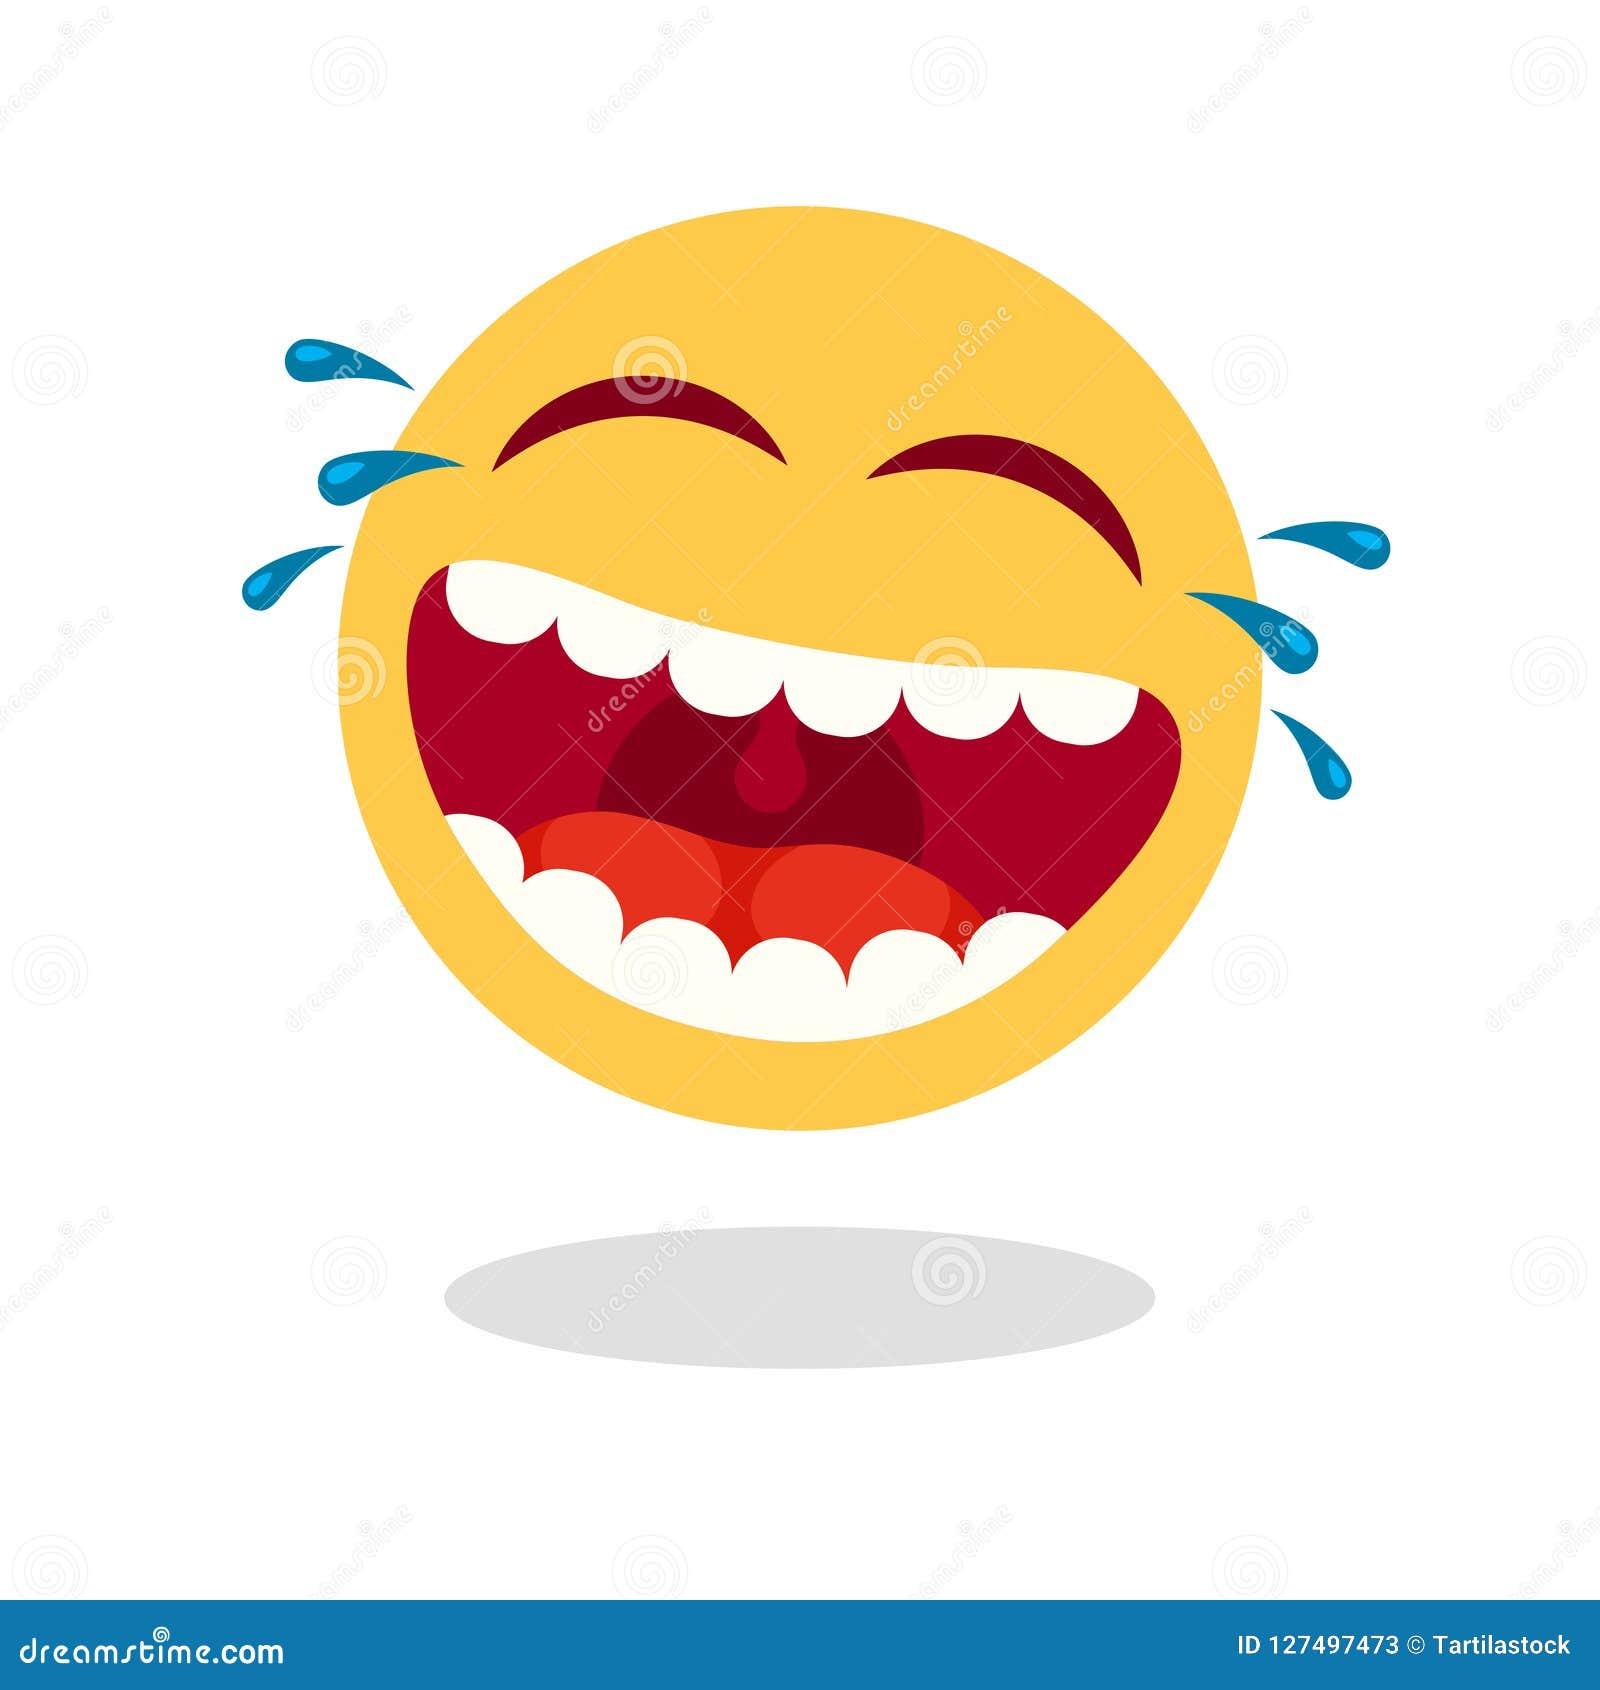 Smiley γέλιου emoticon Ευτυχές πρόσωπο κινούμενων σχεδίων με το στόμα και τα δάκρυα γέλιου Δυνατό διανυσματικό εικονίδιο γέλιου